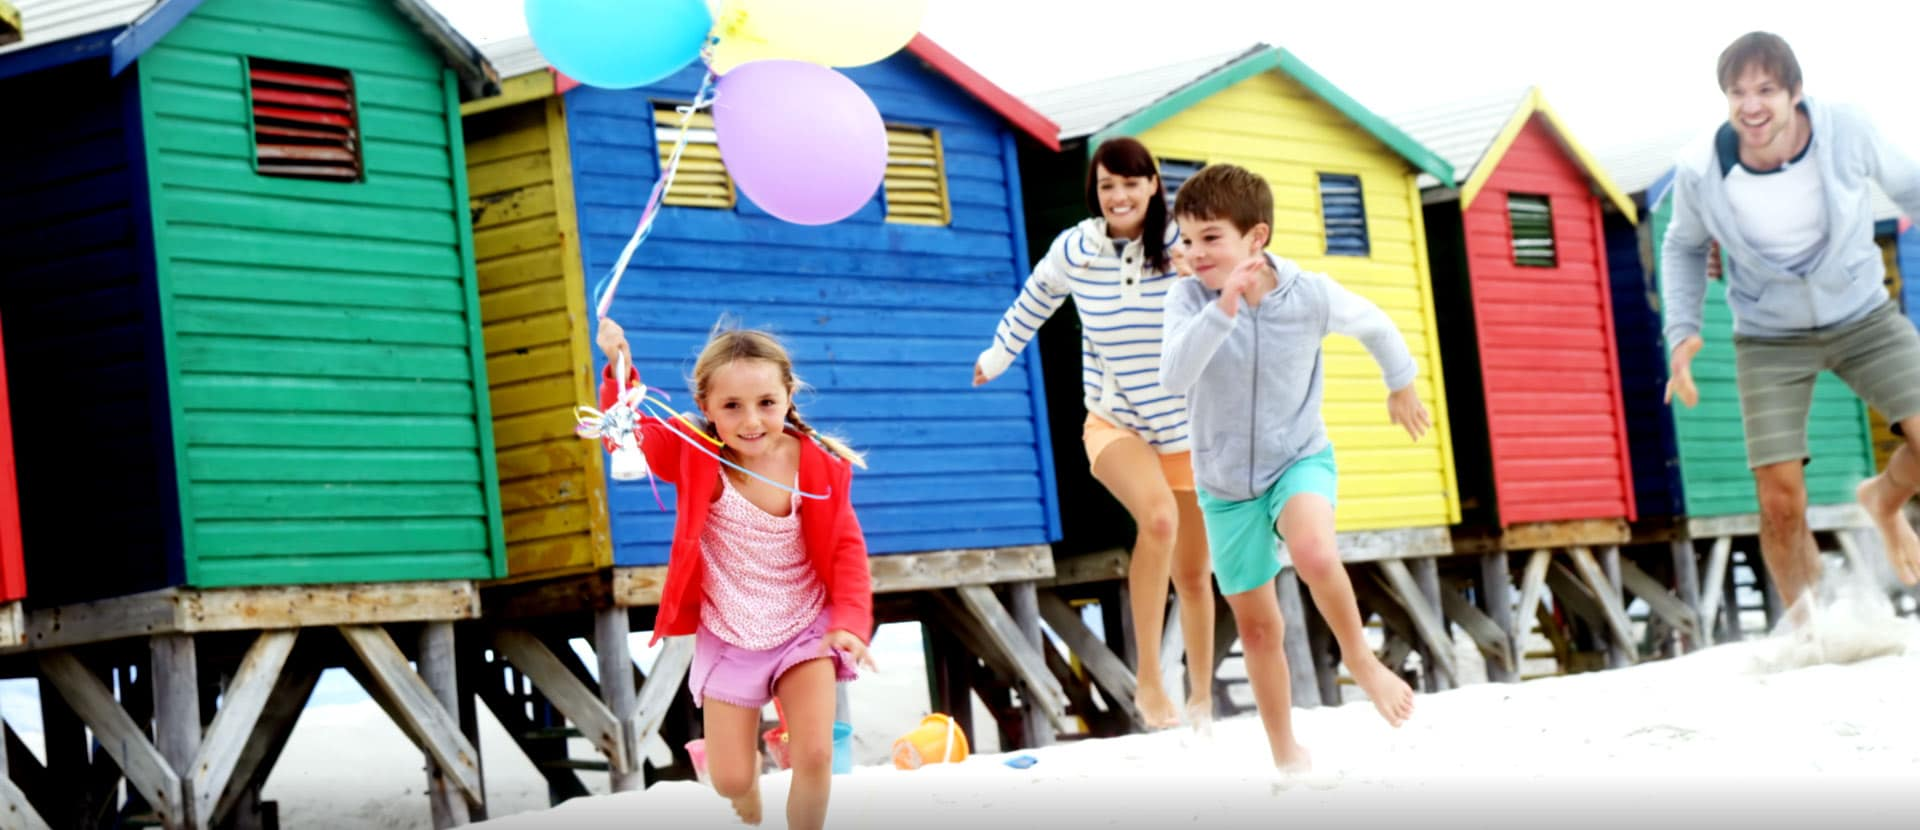 Family running in sand San Leandro Smiles in San Leandro, CA